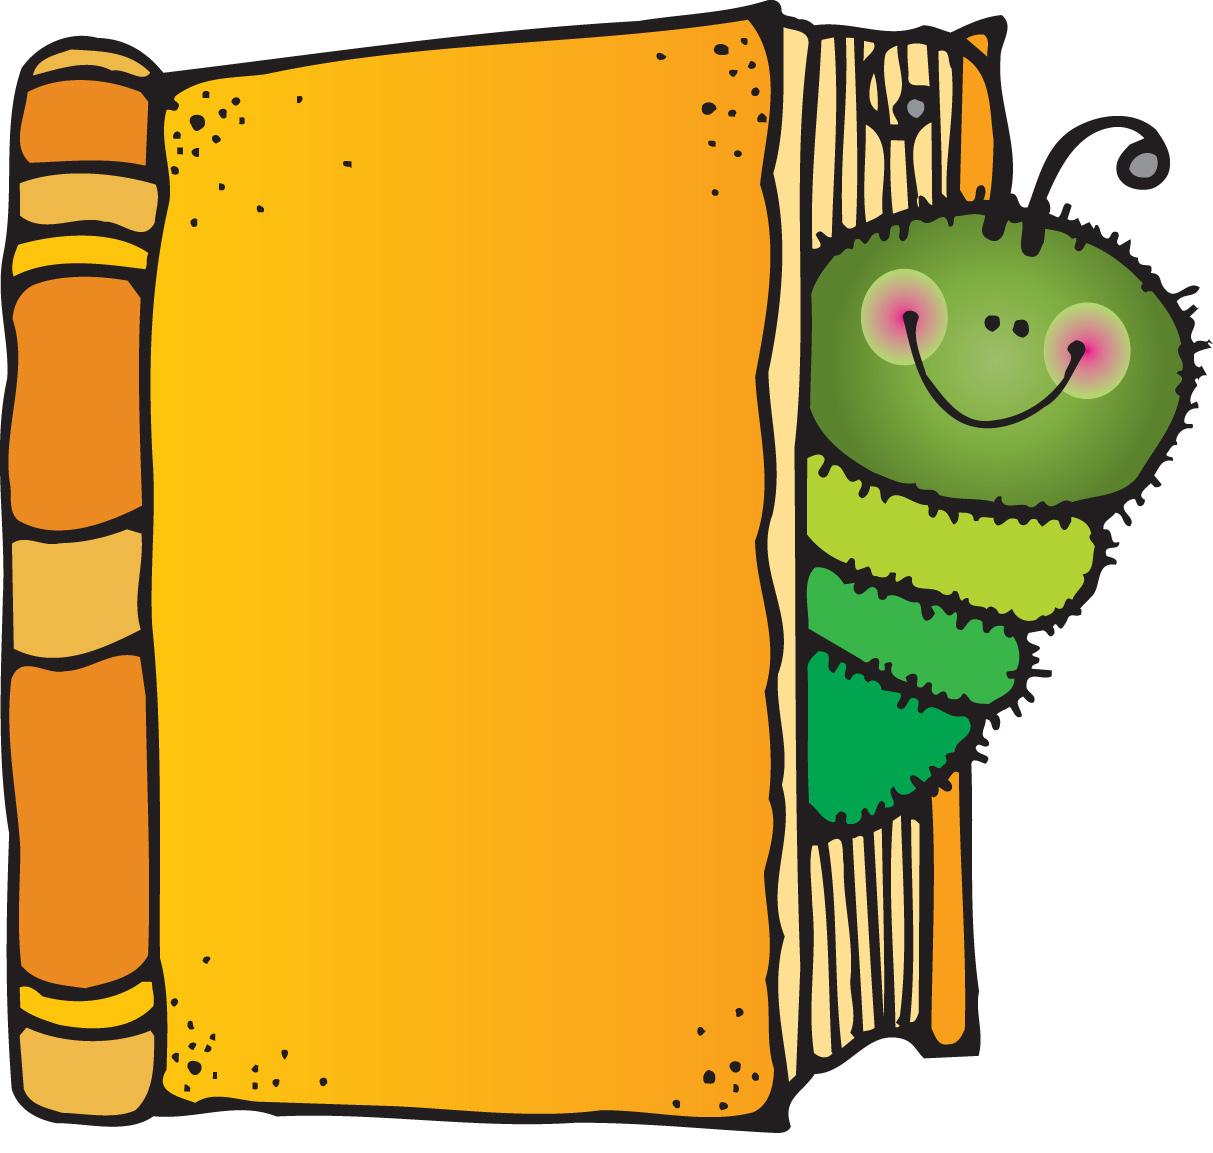 open book cartoon